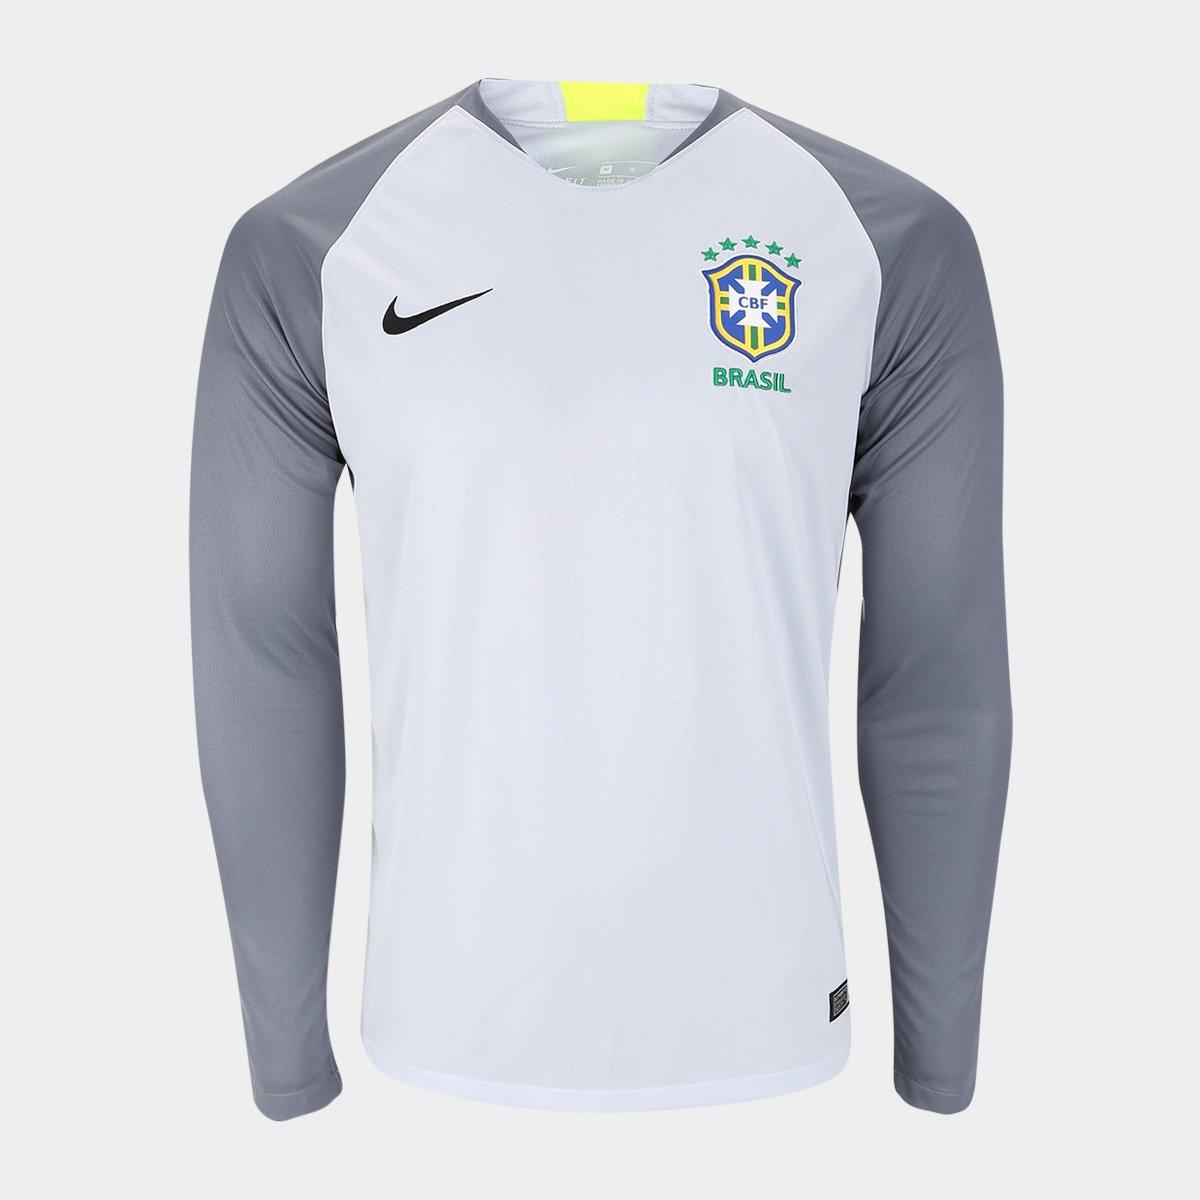 ... Camisa Seleção Brasil Goleiro 2018 nº 23 Ederson M. - Torcedor Nike  Masculina ... 06bae3f925418